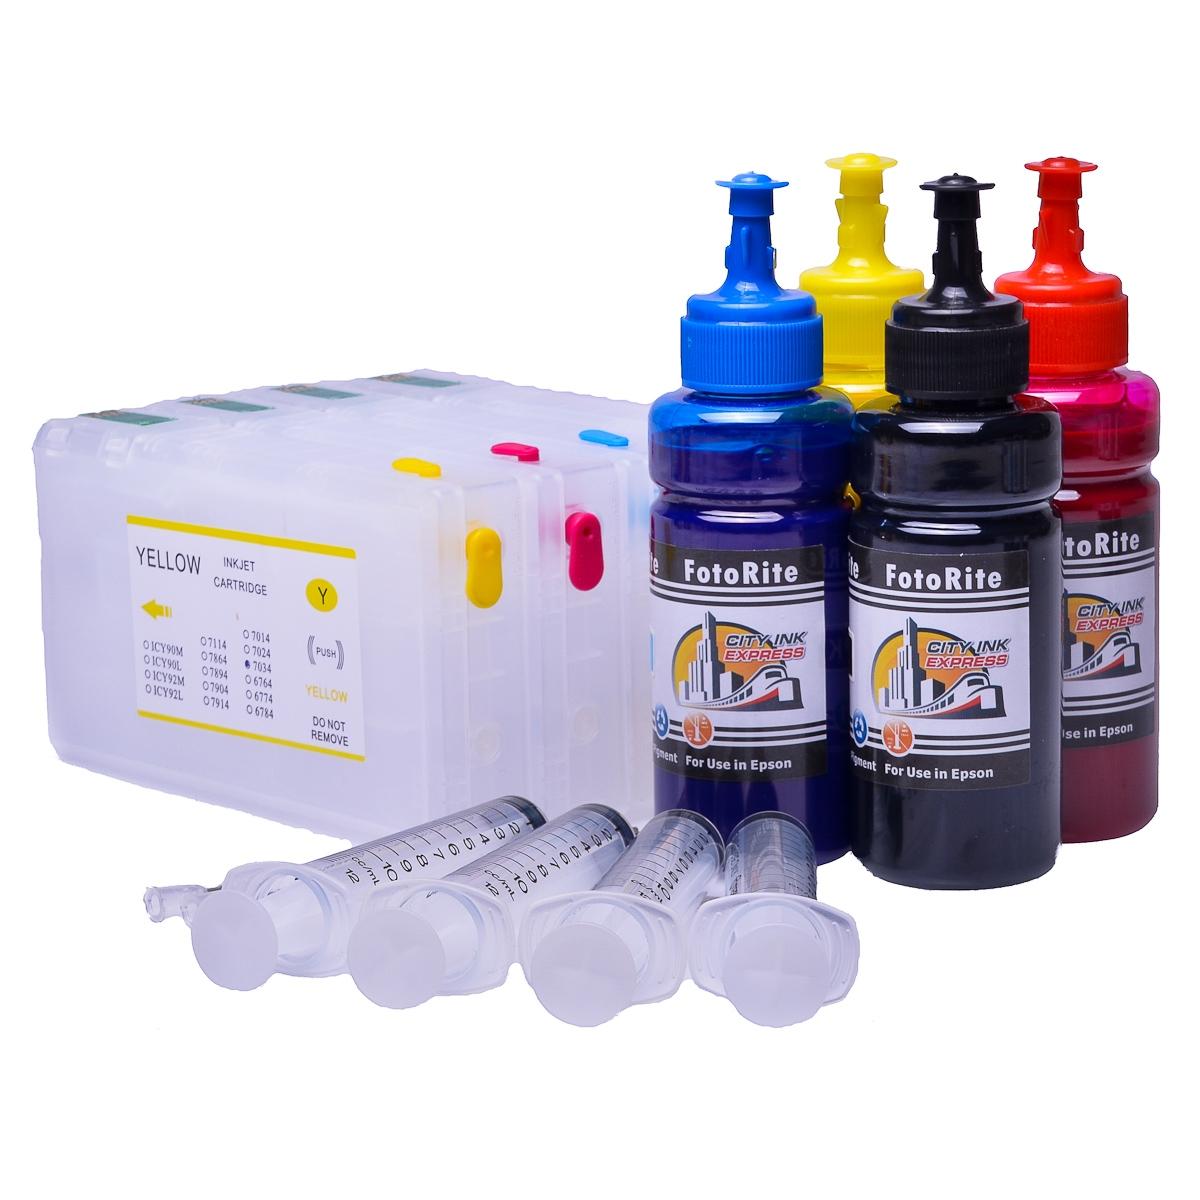 Refillable pigment Cheap printer cartridges for Epson WP-4515DN C13T70314010 T7031 Black #5